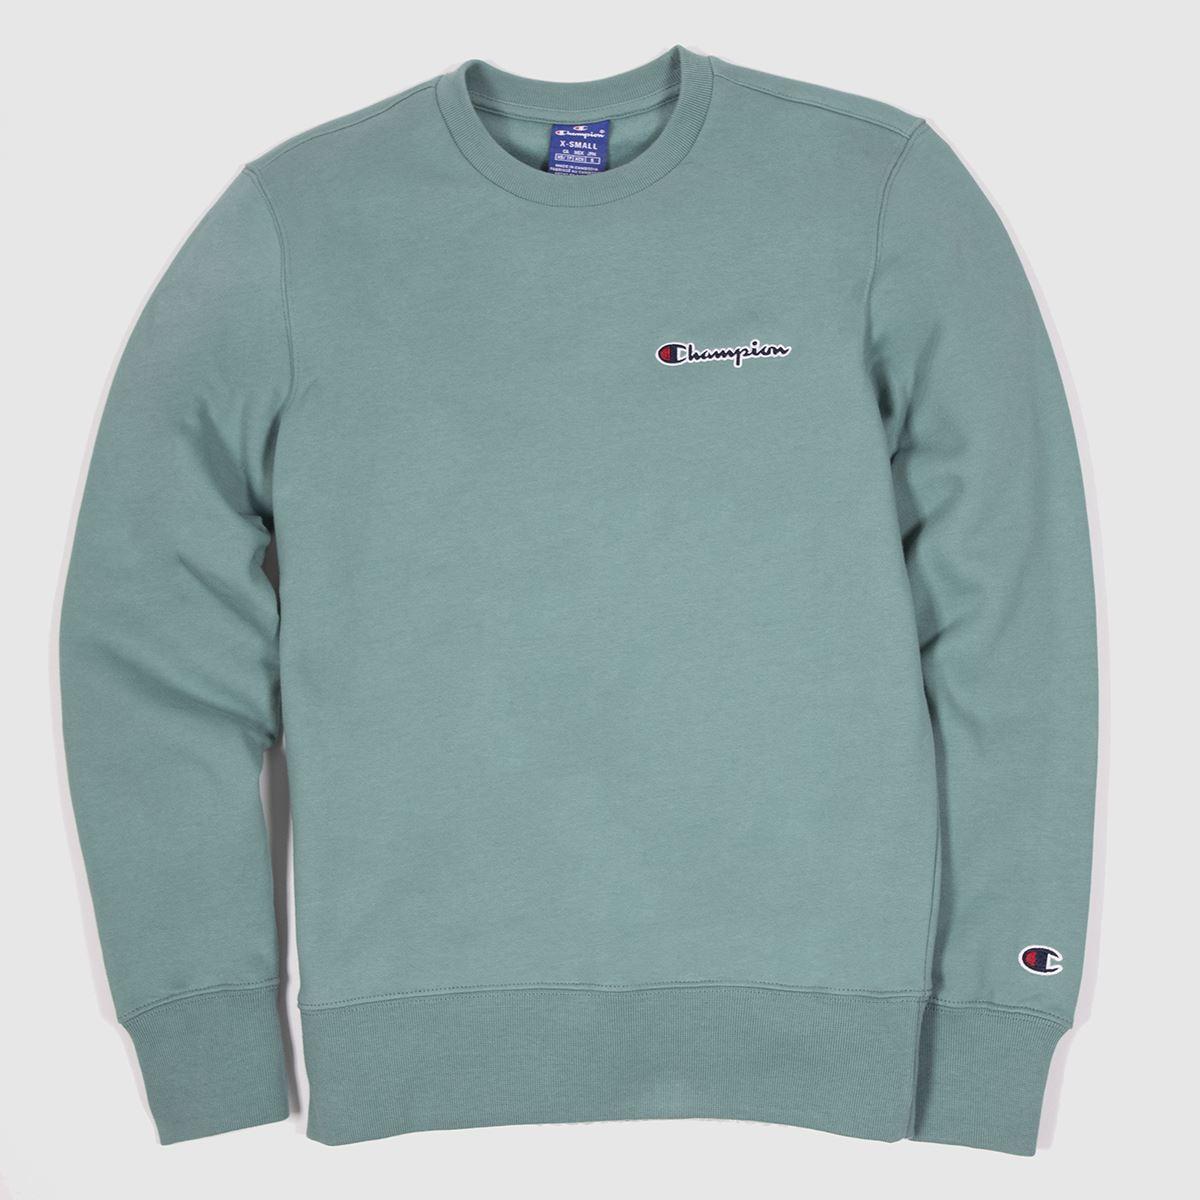 Champion Green Crewneck Sweatshirt